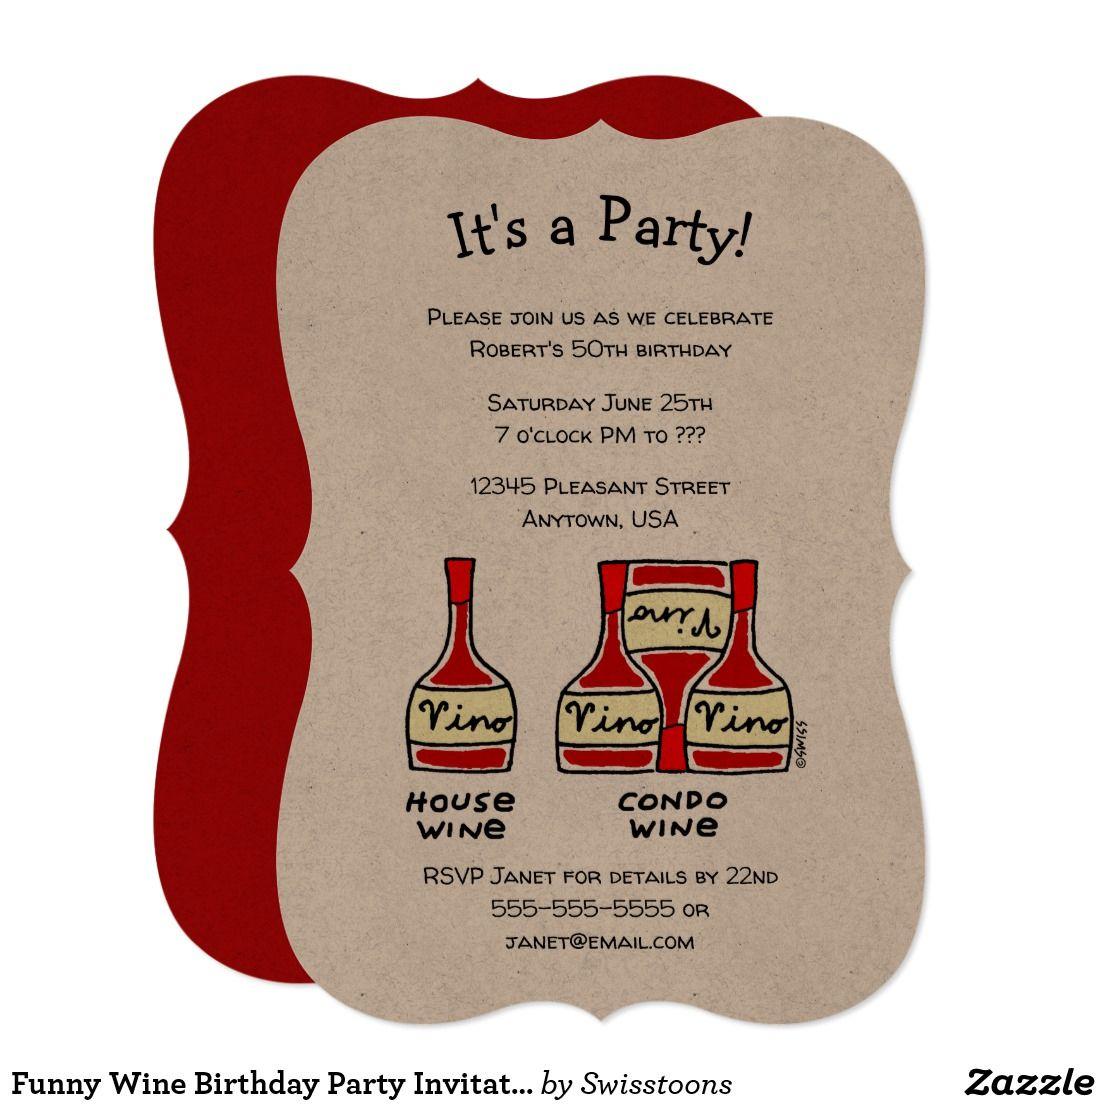 Funny Wine Birthday Party Invitations Zazzle Com Birthday Wine Wine Birthday Party Birthday Party Invitations